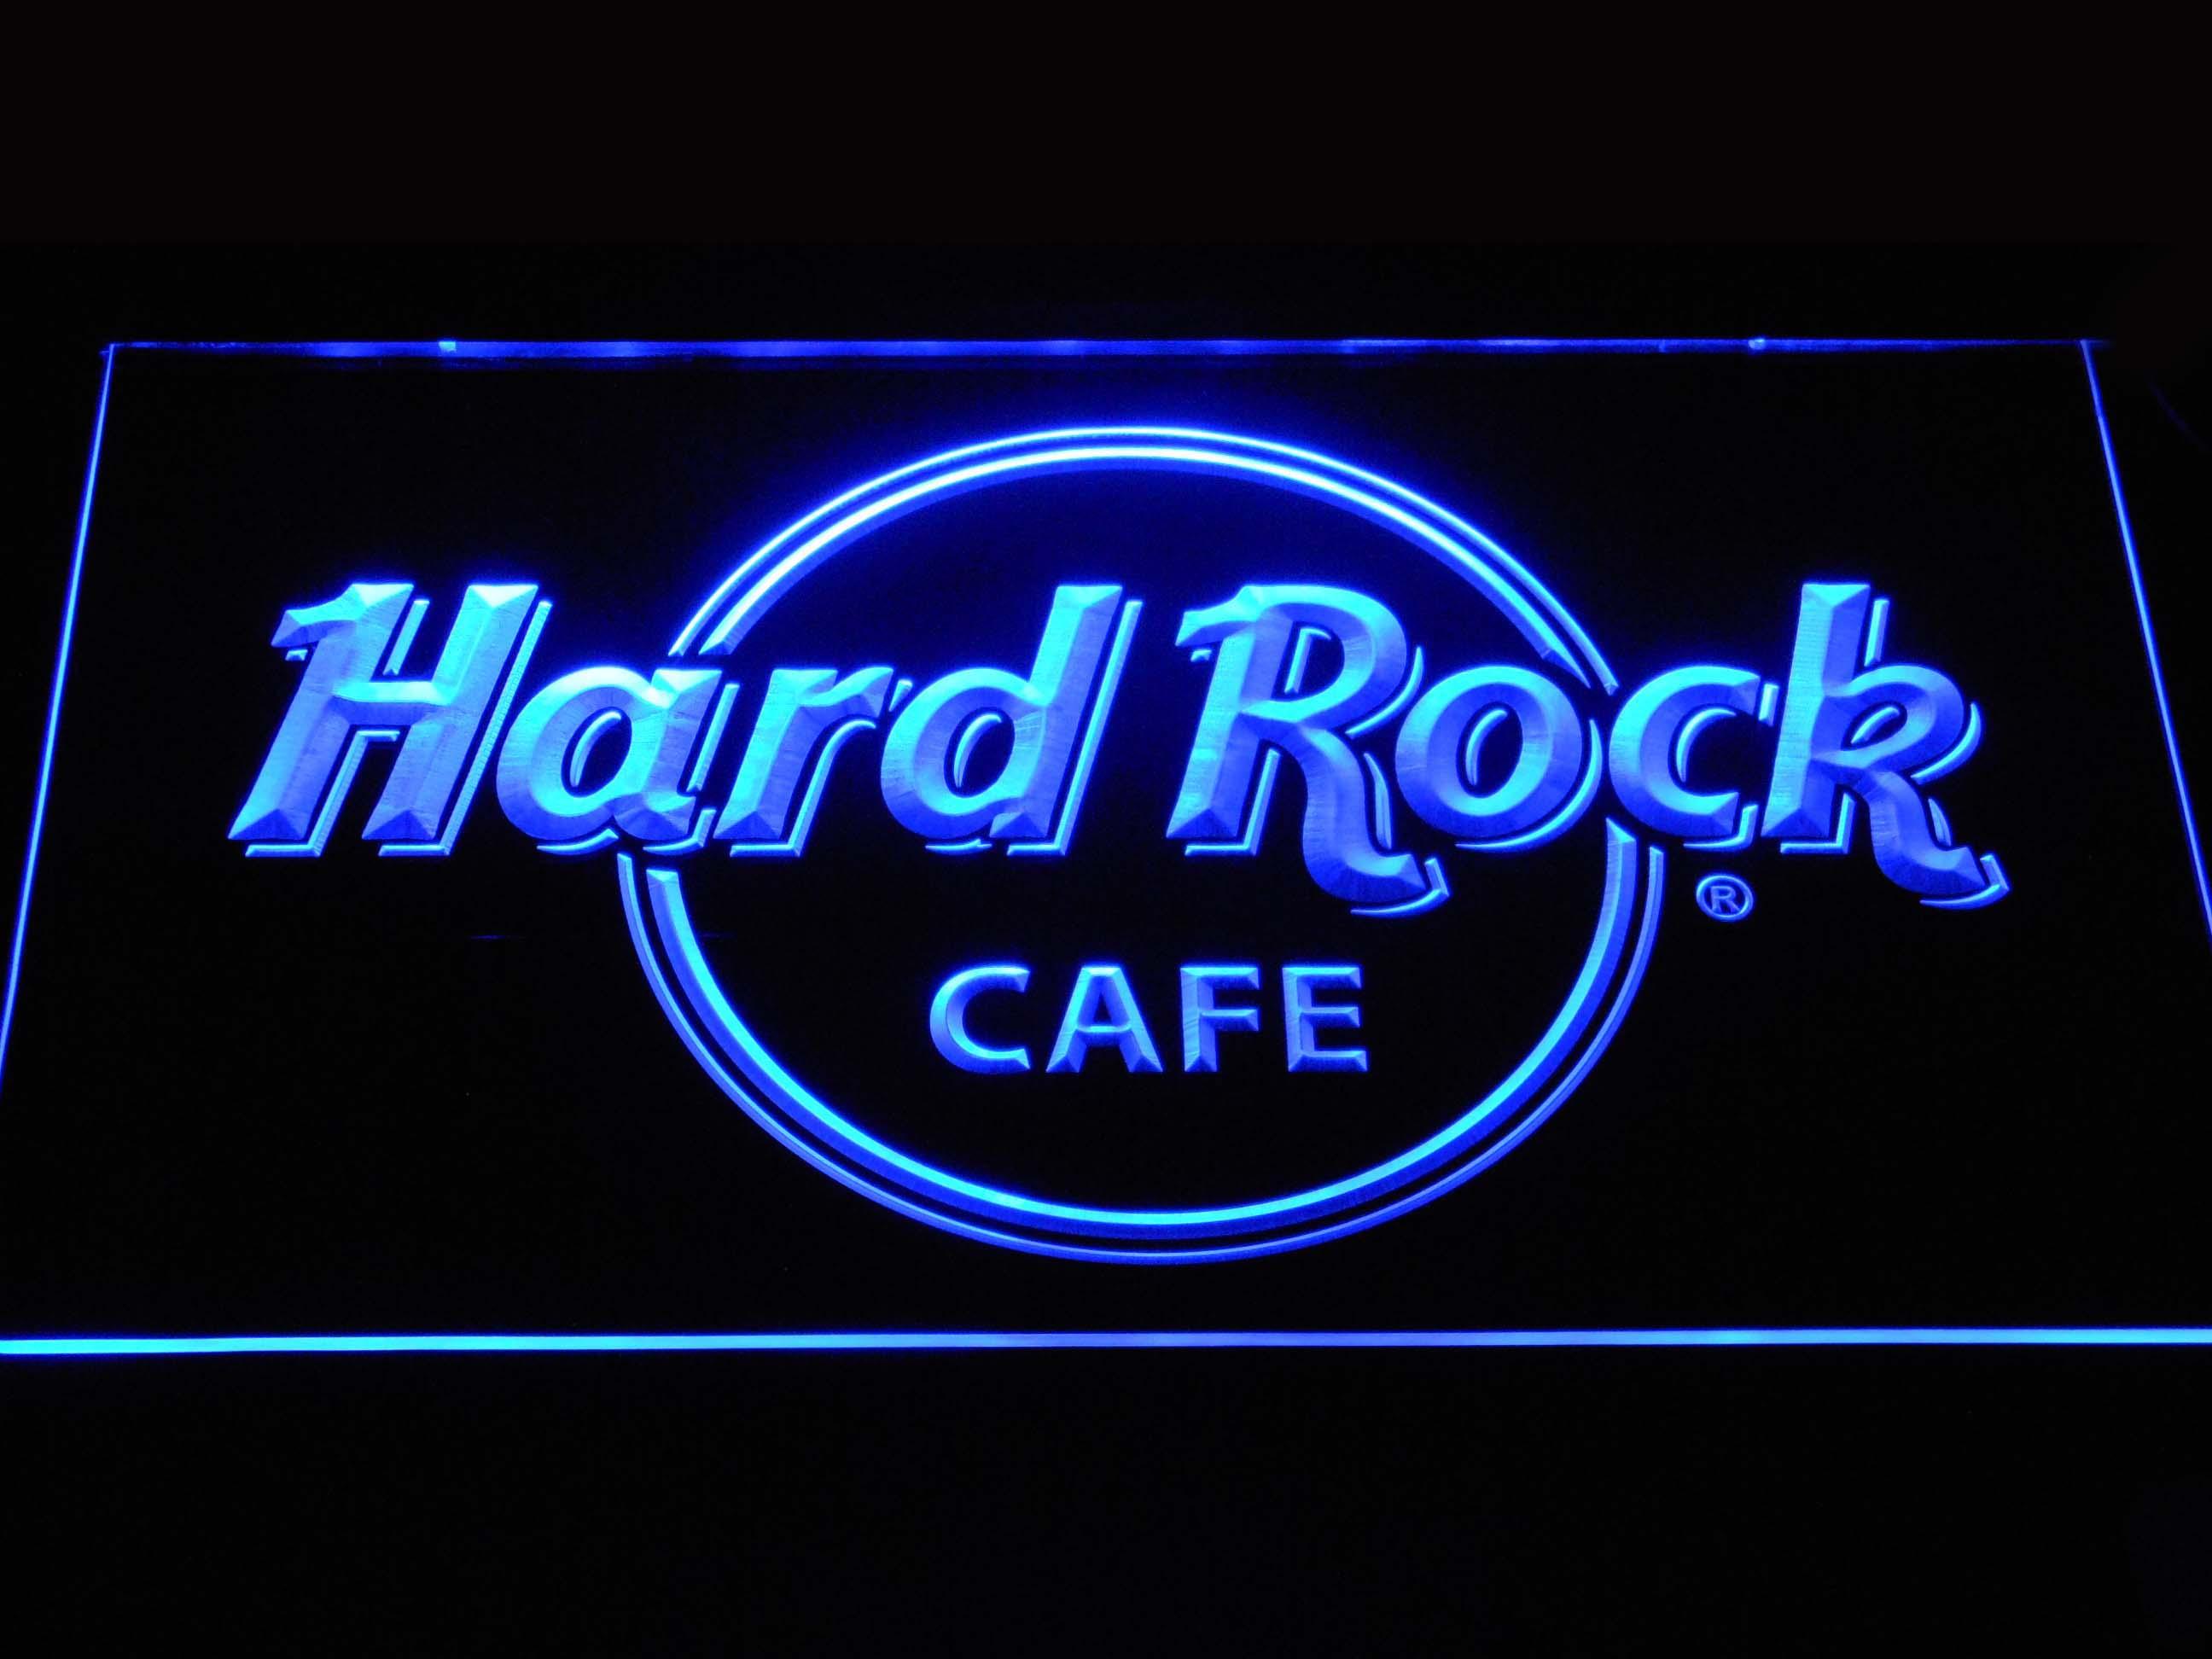 Cartel de neón a251 Hard Rock Cafe LED con interruptor On/Off 7 colores a elegir